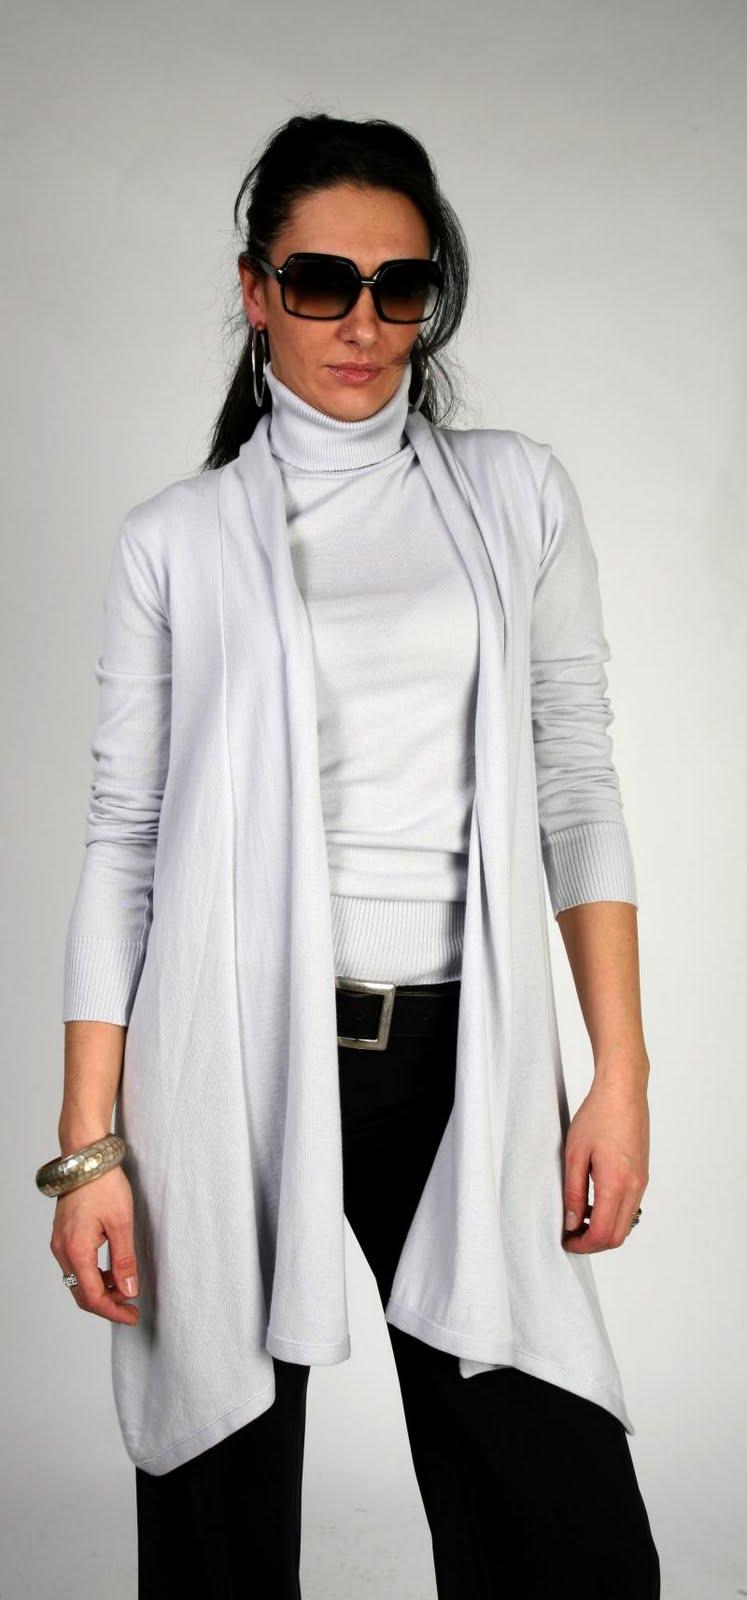 Italian Tops Women Clothing Pullovers | FASHIONGURU99